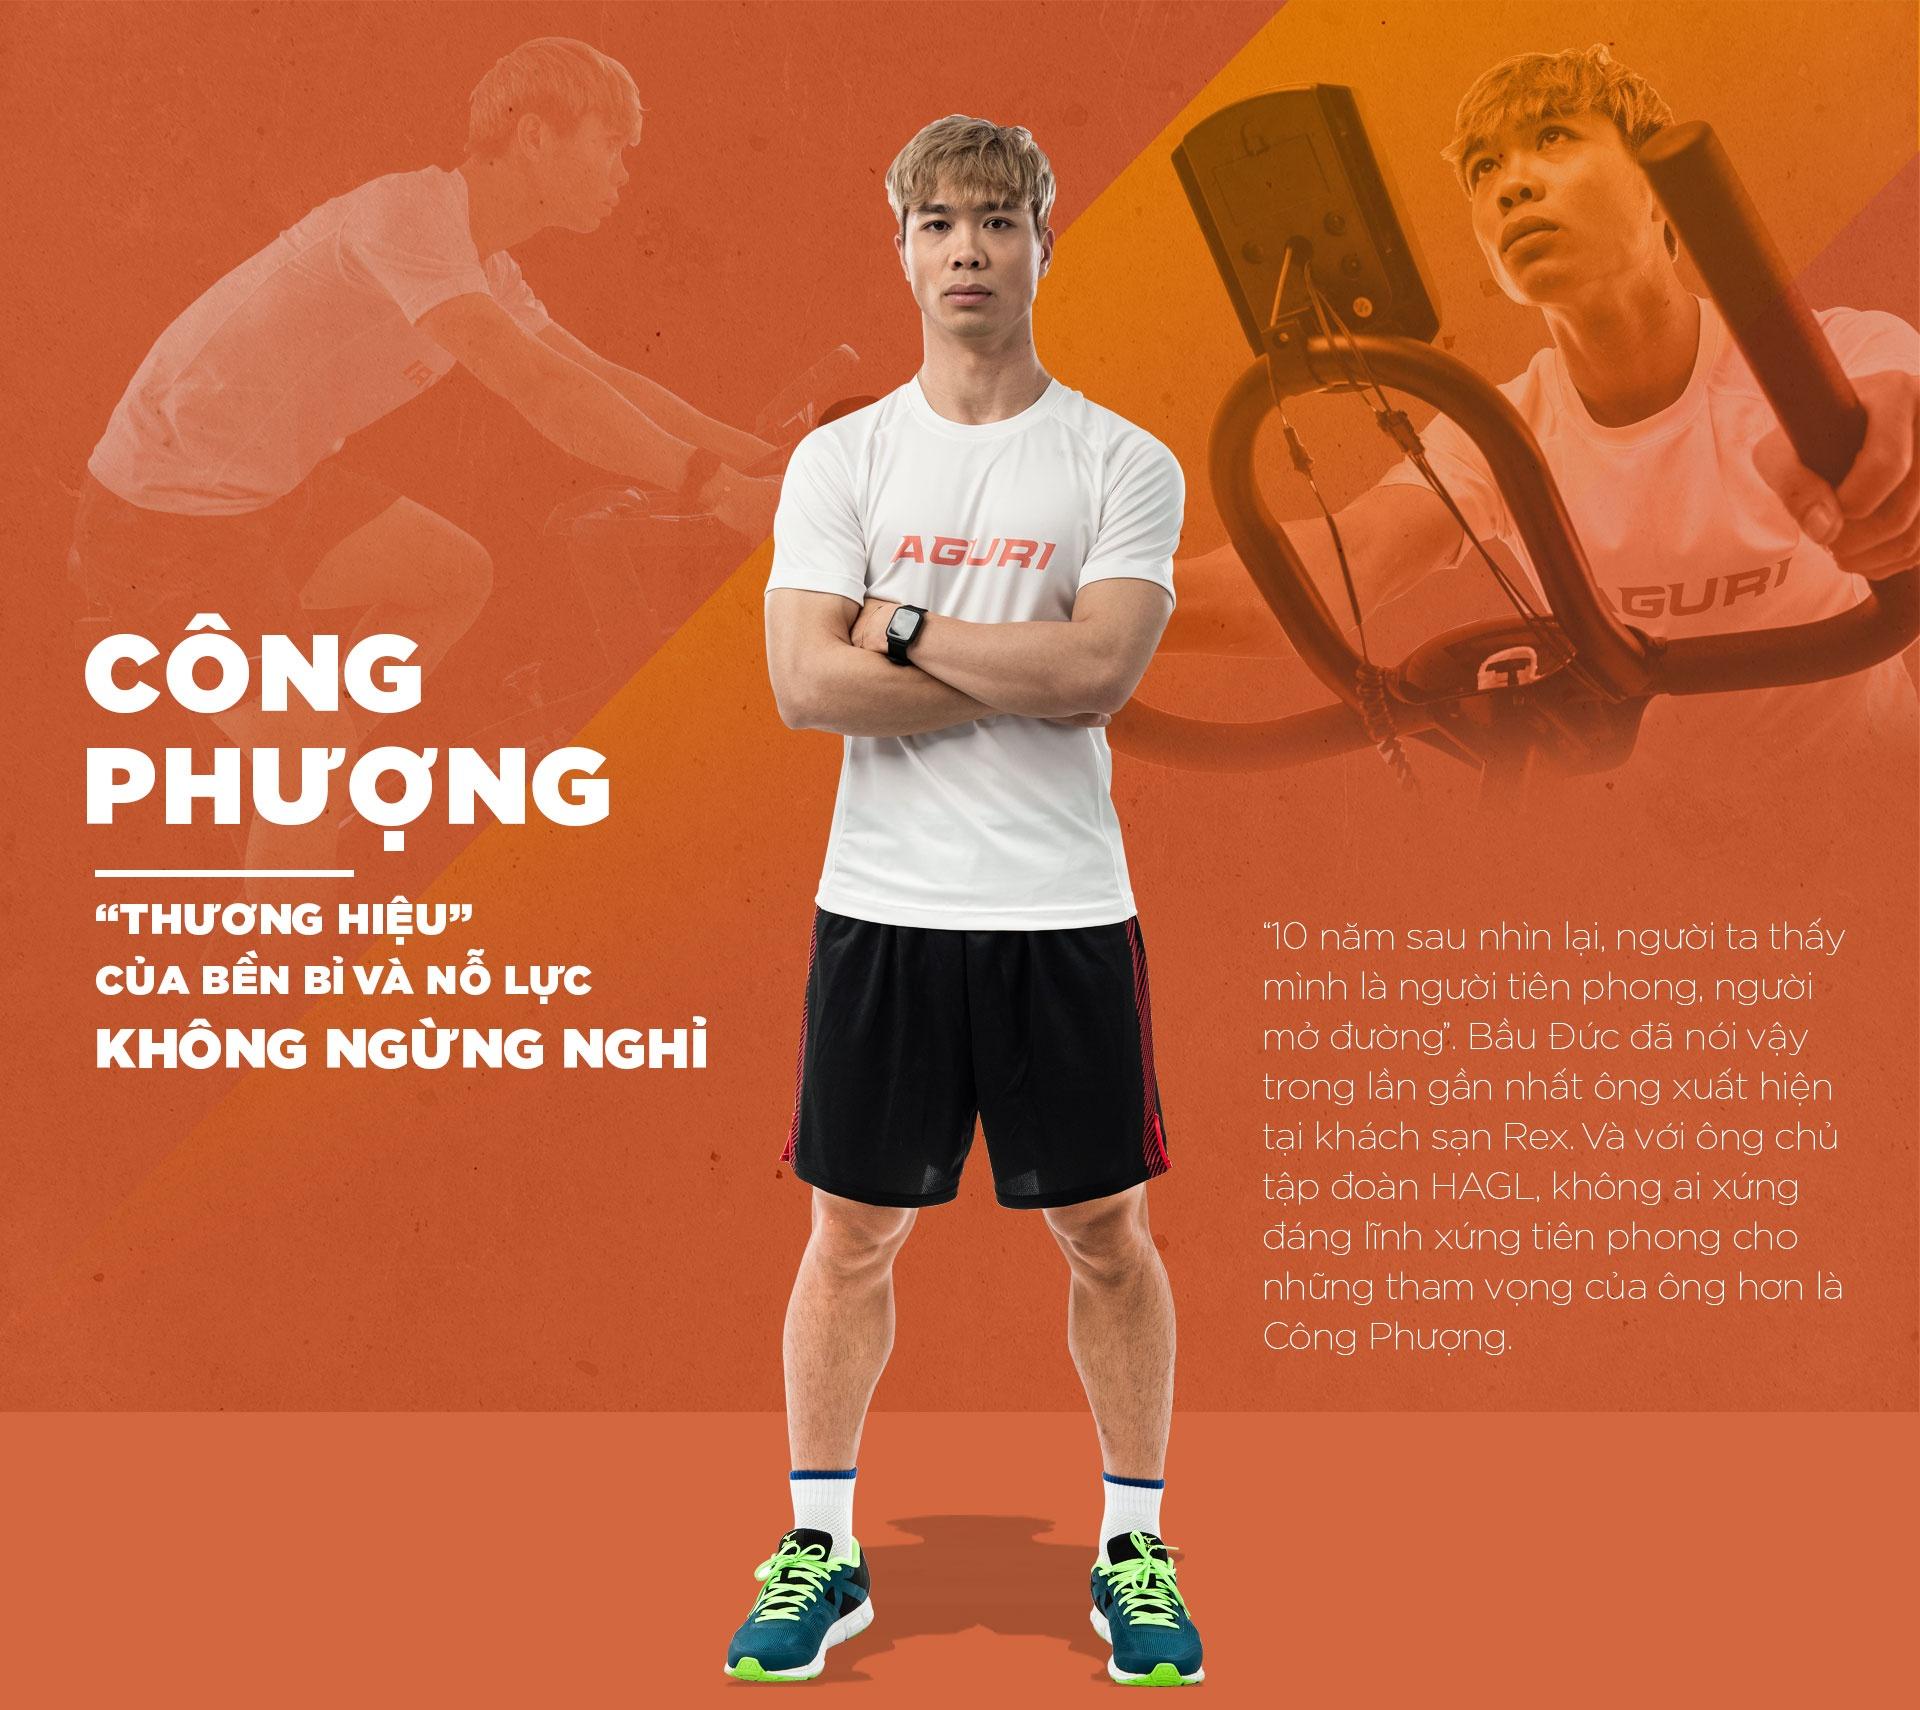 cong phuong thuong hieu cua ben bi va no luc khong ngung nghi